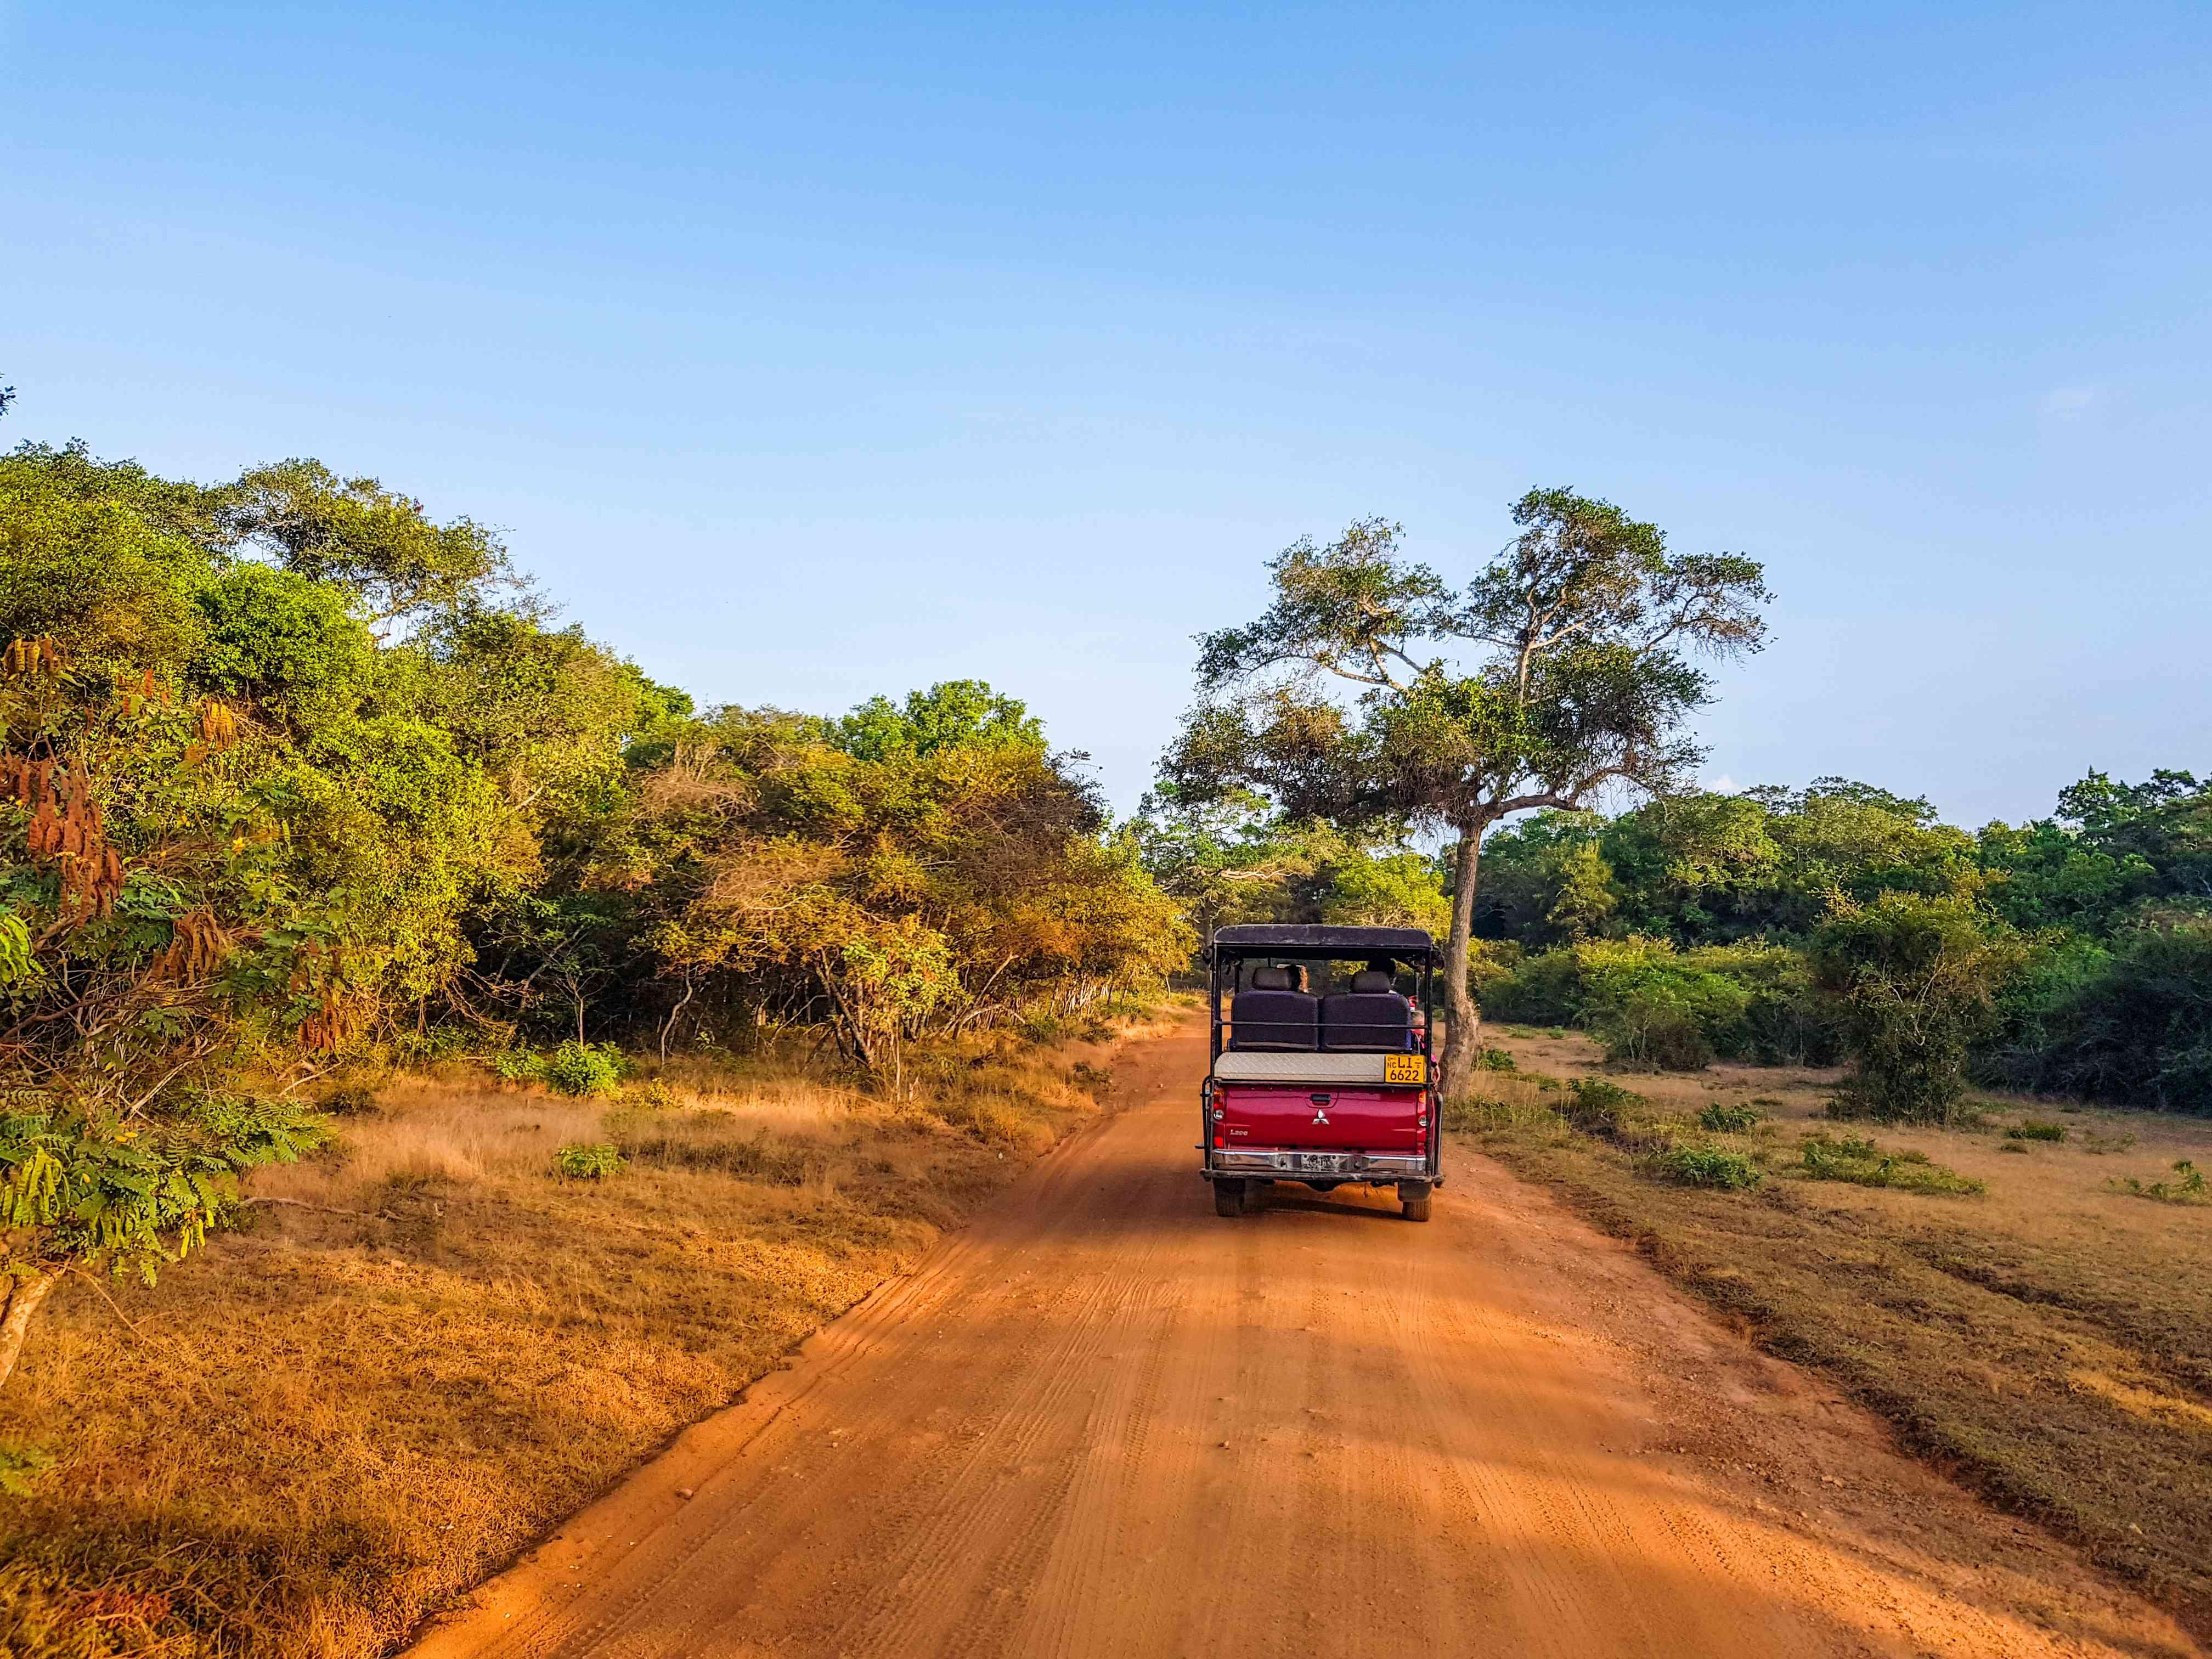 A 4x4 vehicle driving on safari in Sri Lanka